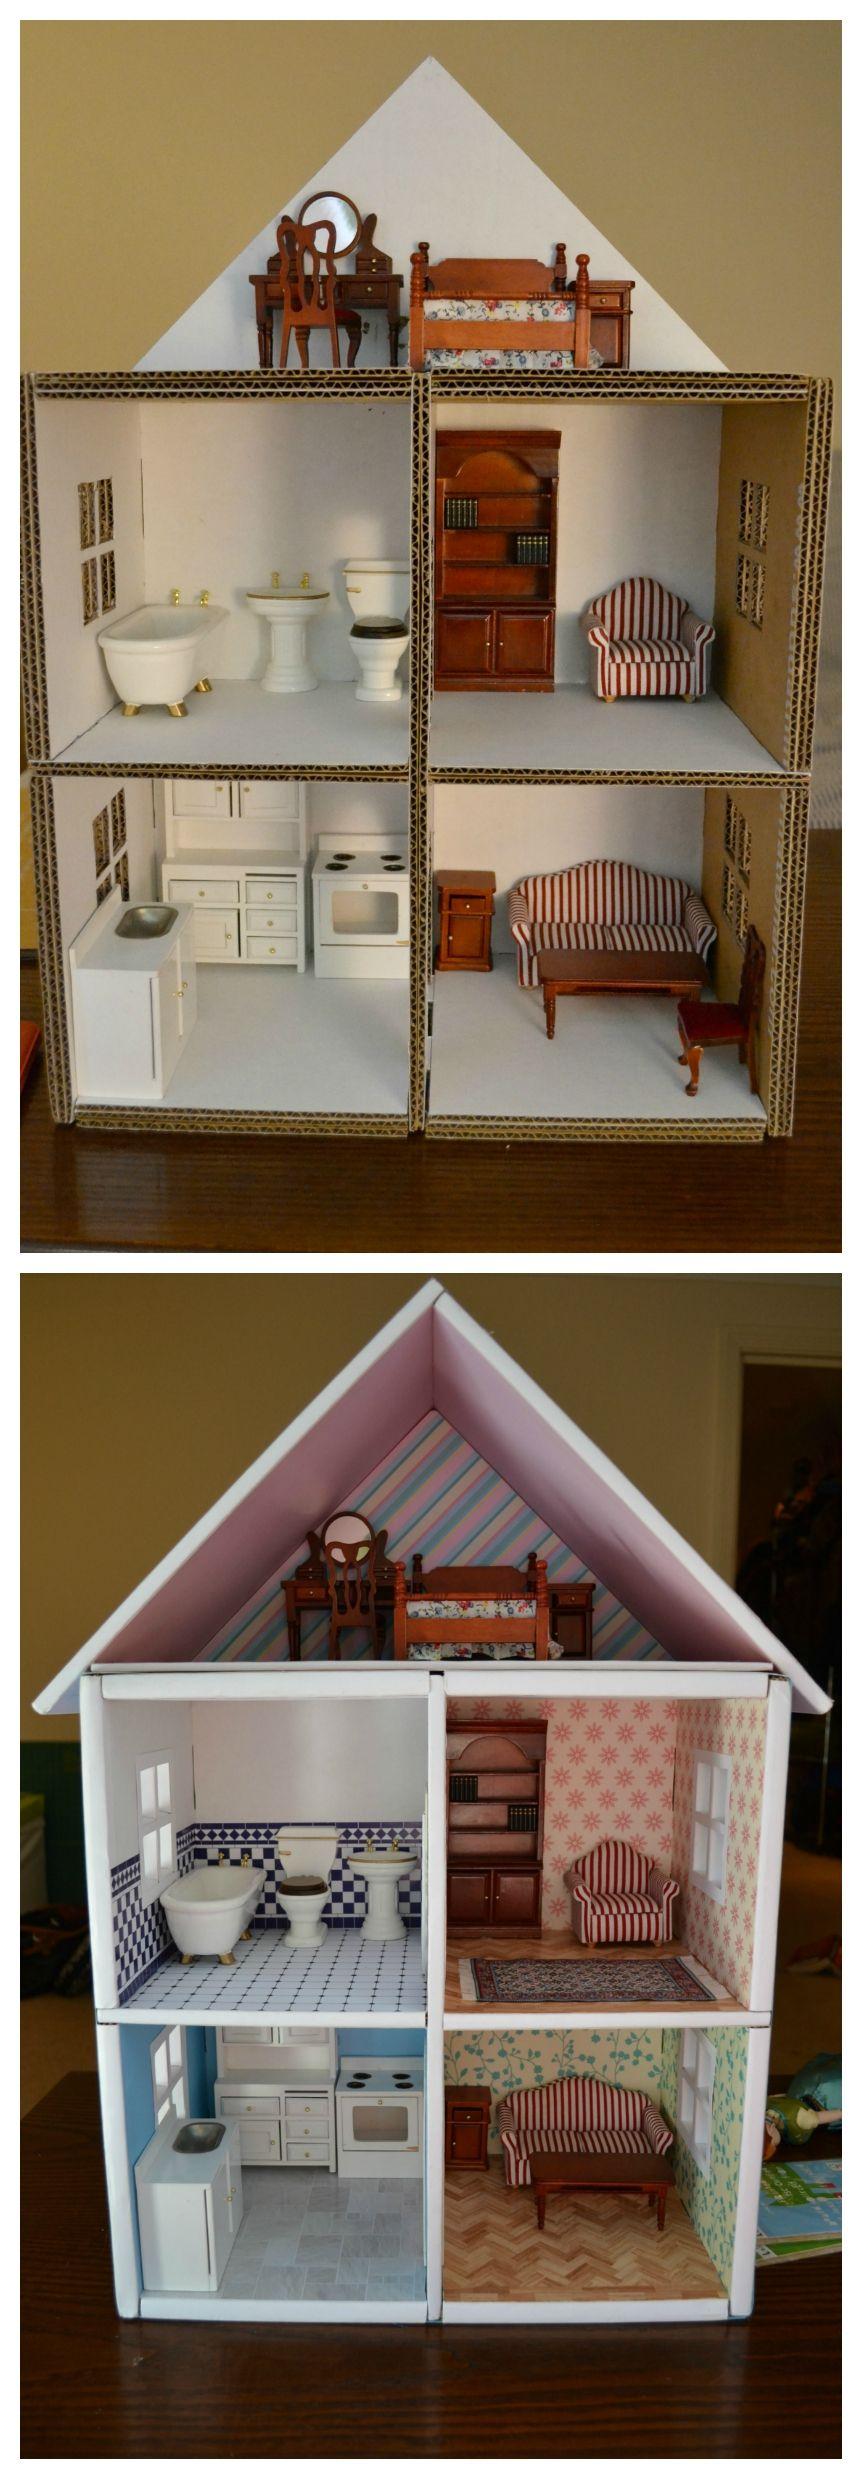 diy dollhouse made from cardboard boxes baby pinterest puppen diy puppenhaus und barbie haus. Black Bedroom Furniture Sets. Home Design Ideas